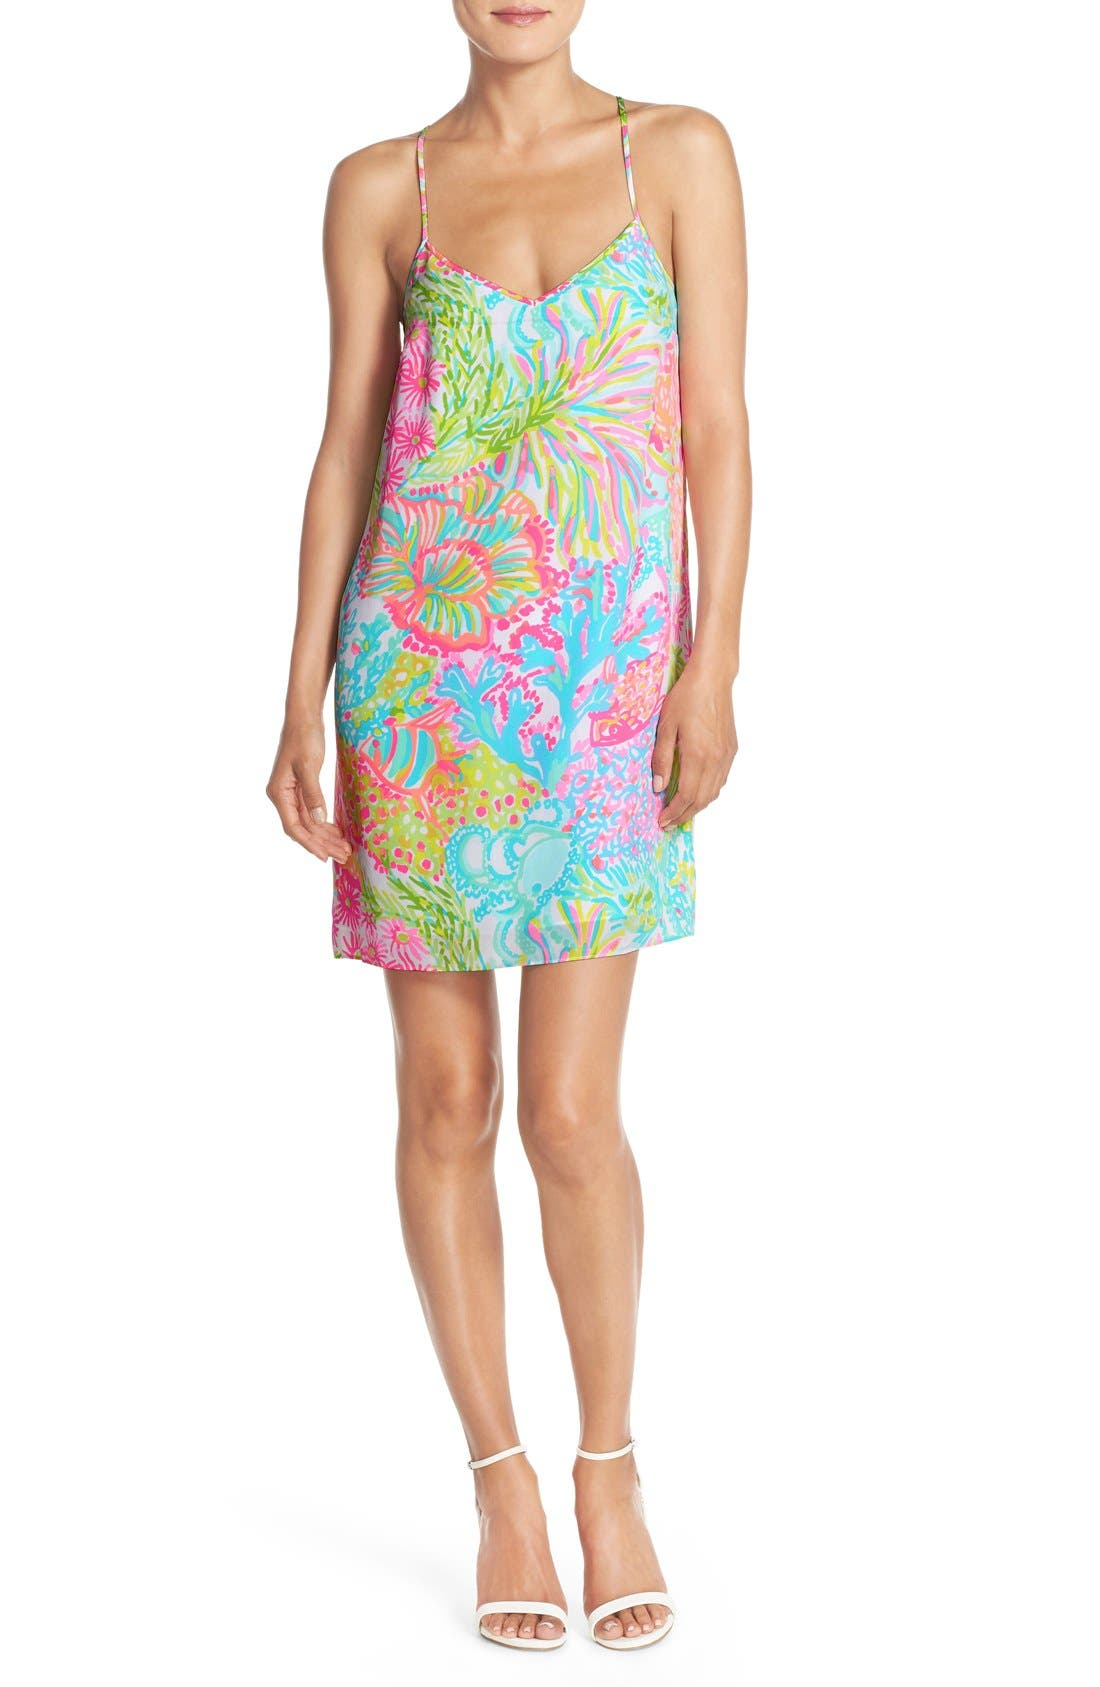 Alternate Image 1 Selected - Lilly Pulitzer® 'Dusk' Print Silk Slipdress